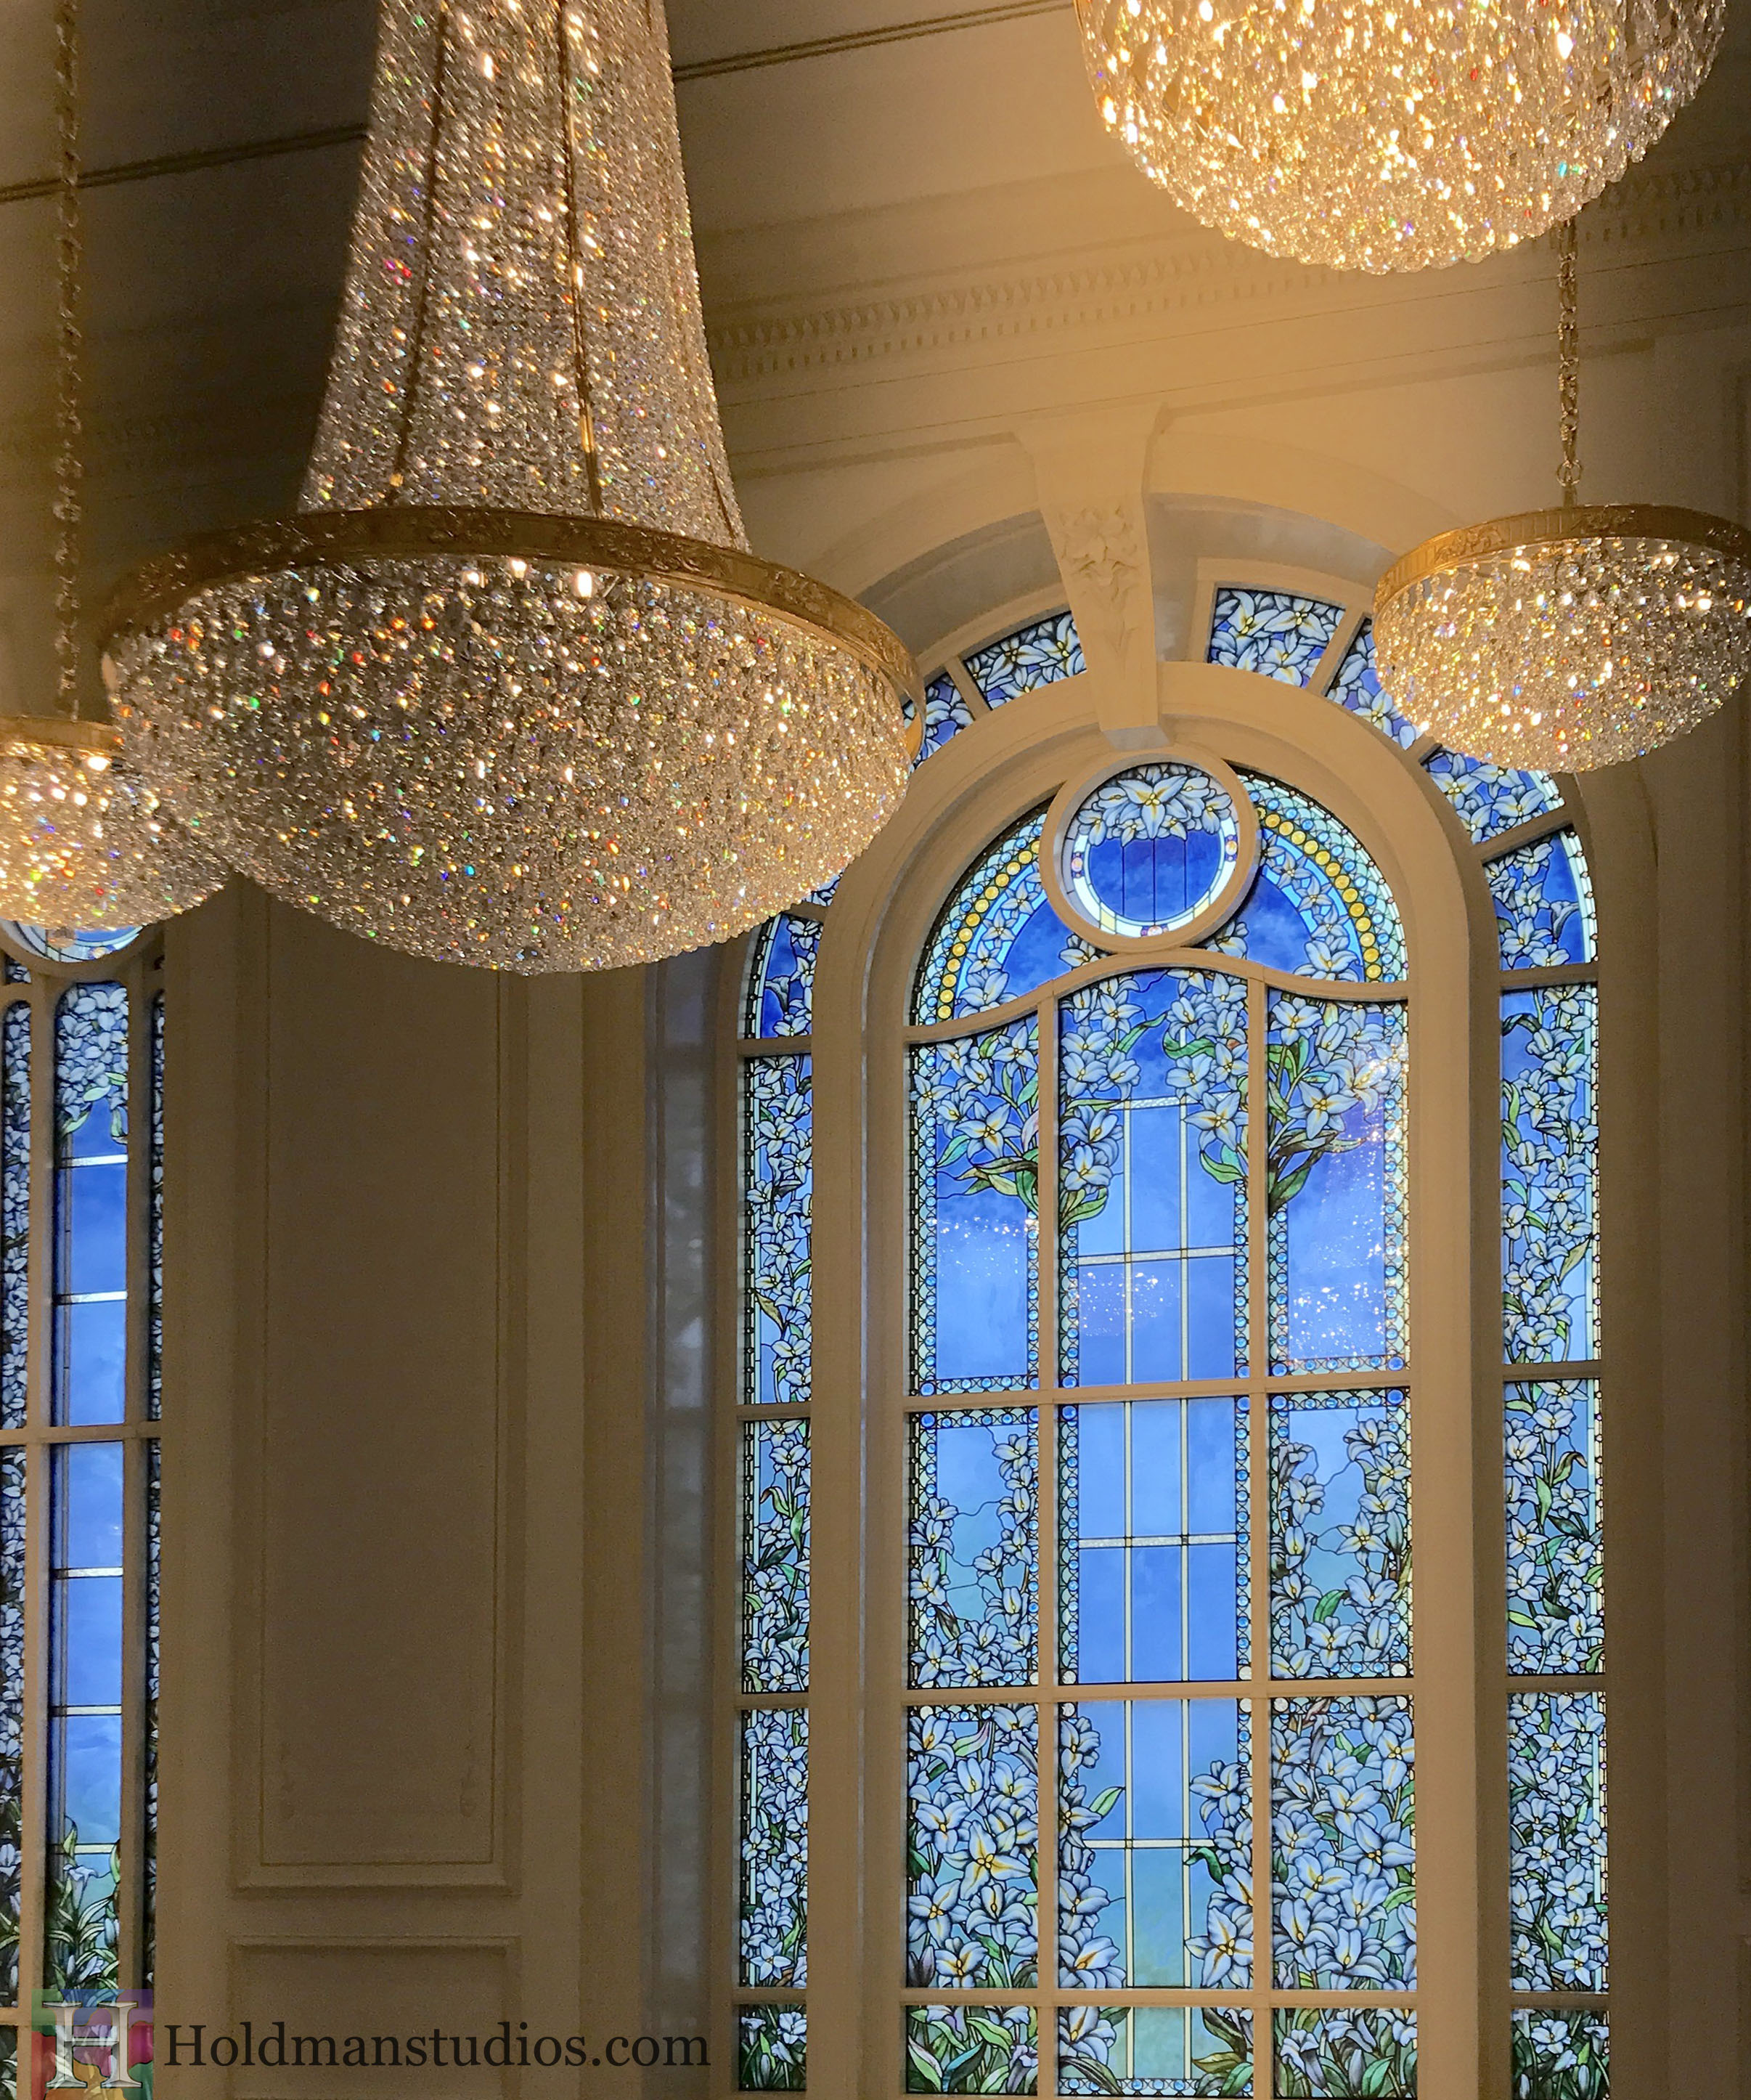 Holdman-Studios-Paris-LDS-Temple-Stained-Glass-Madonna-Lily-Flowers-Leaves-Sun-Moon-Stars-Windows-Chandeliers.jpg